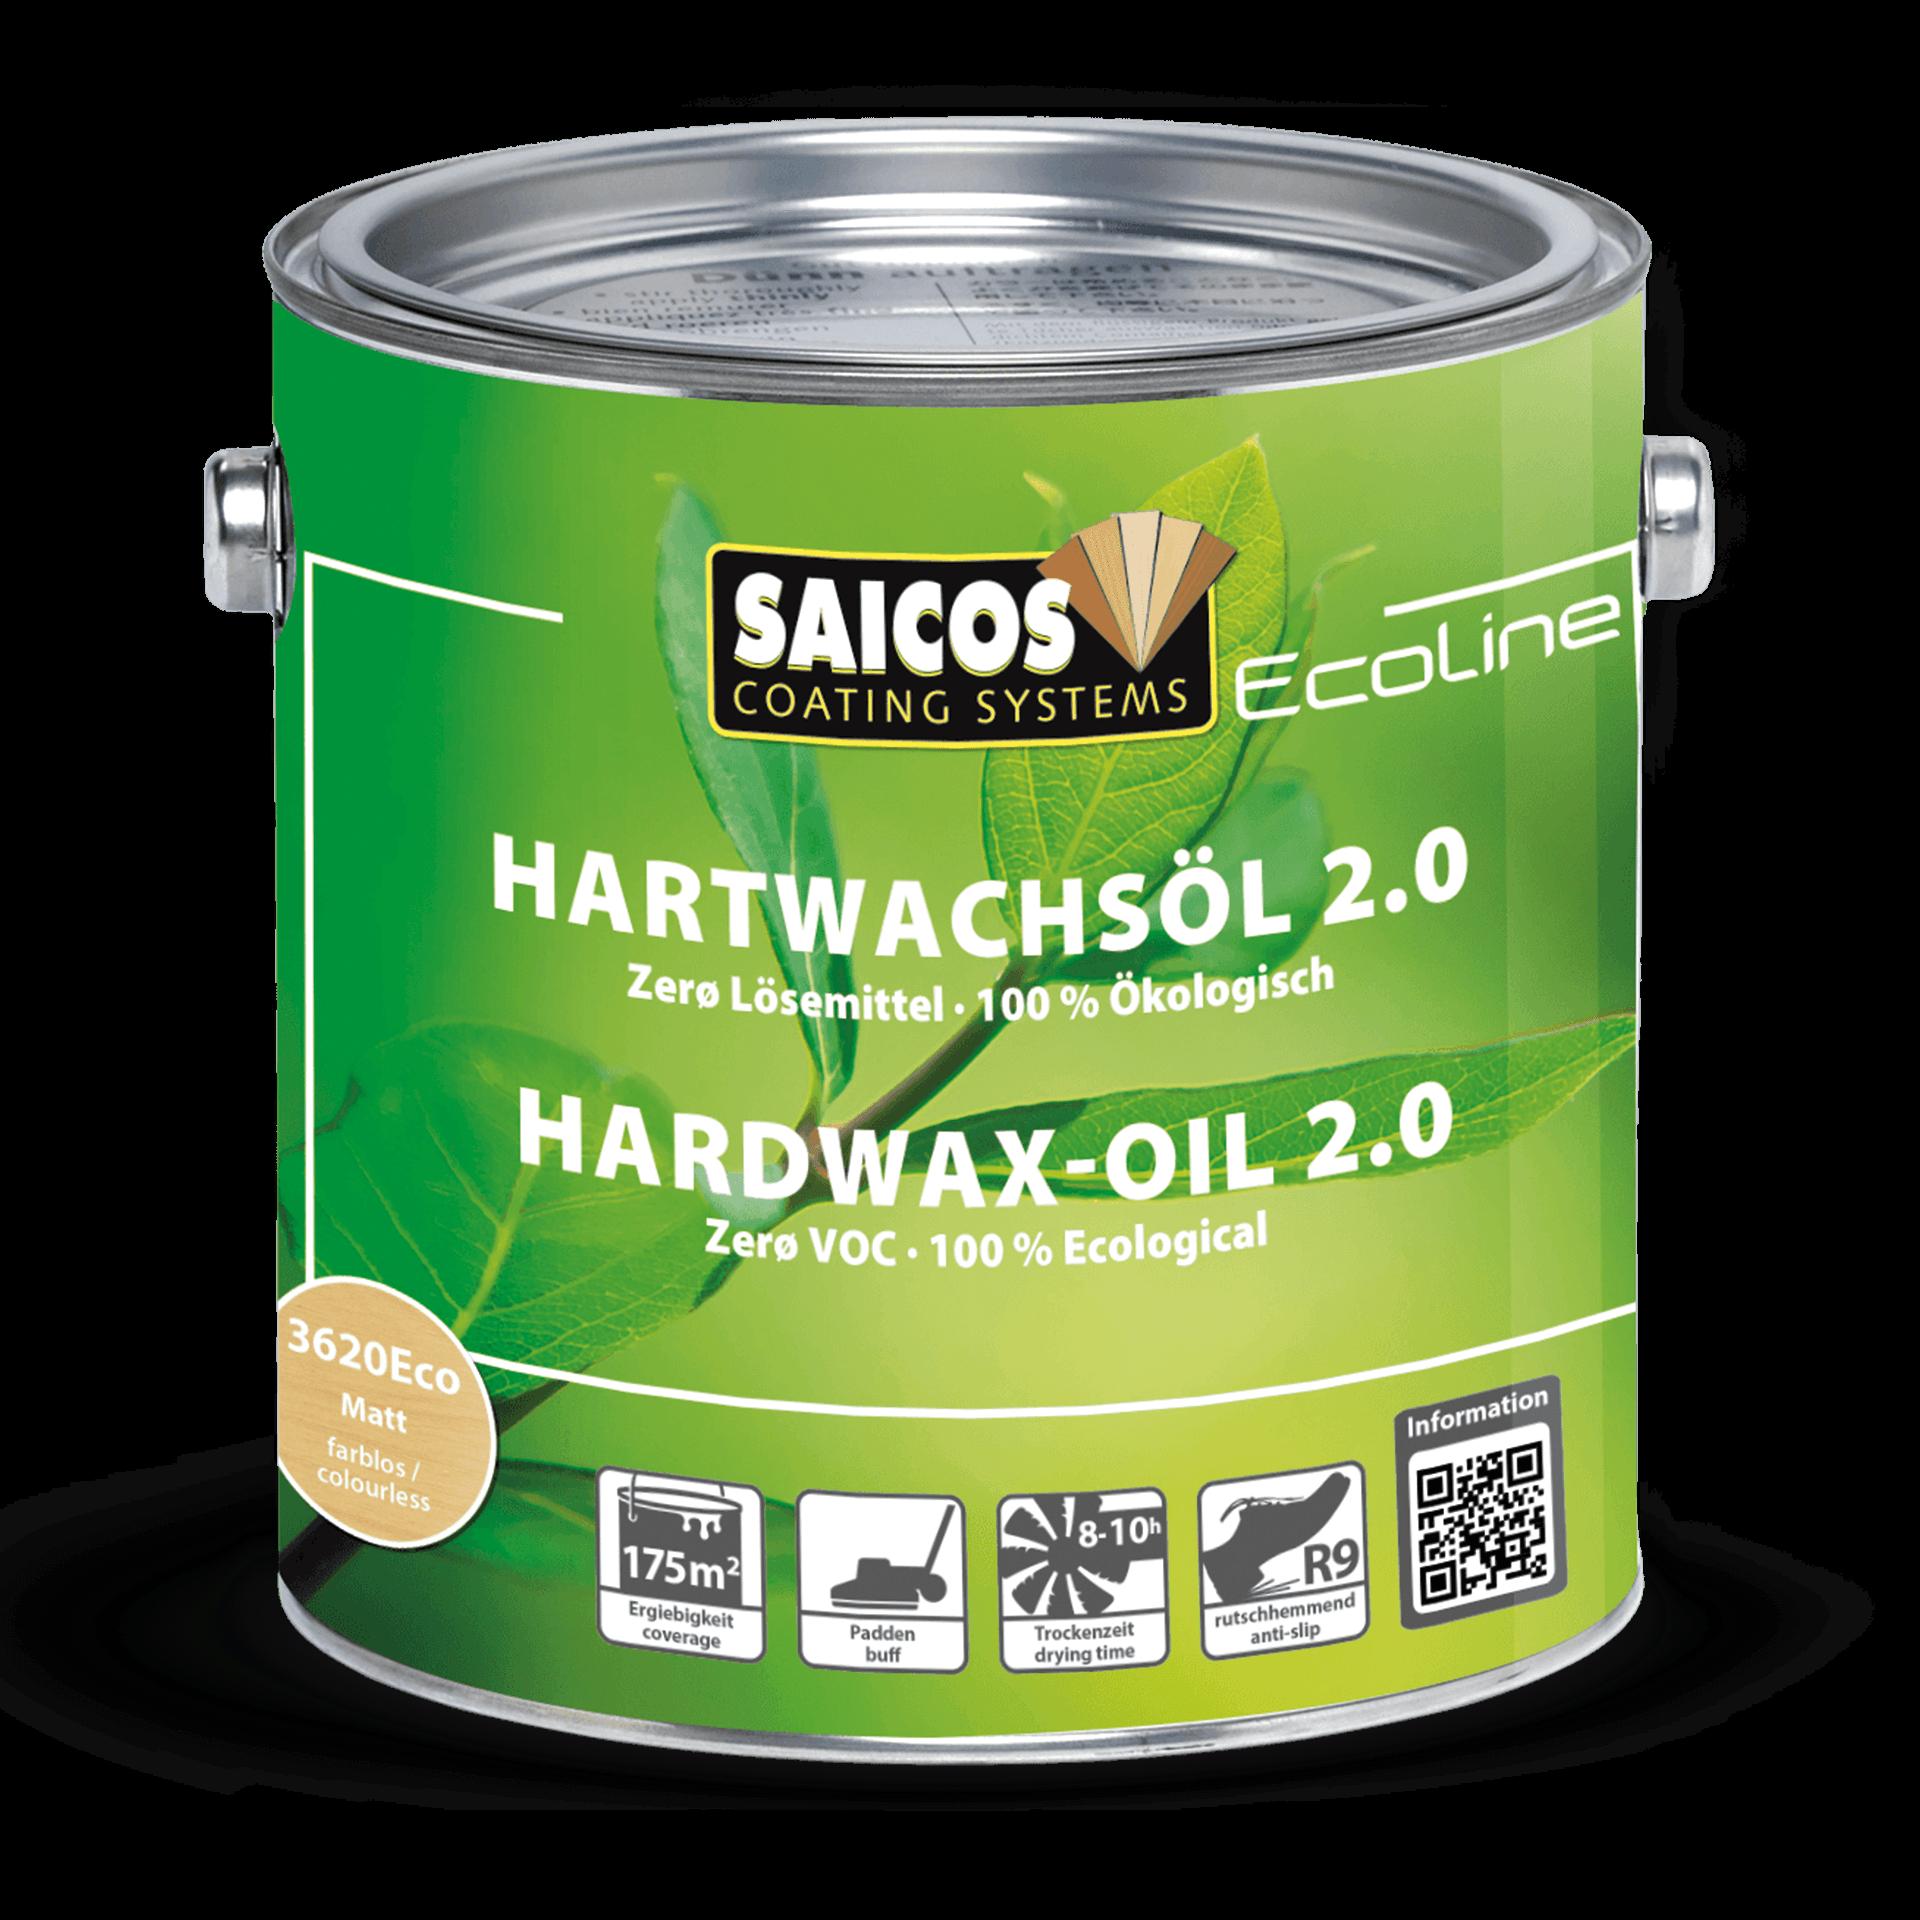 Saicos Ecoline Hartwachsöl 2.0 lösemittelfrei ökologisch